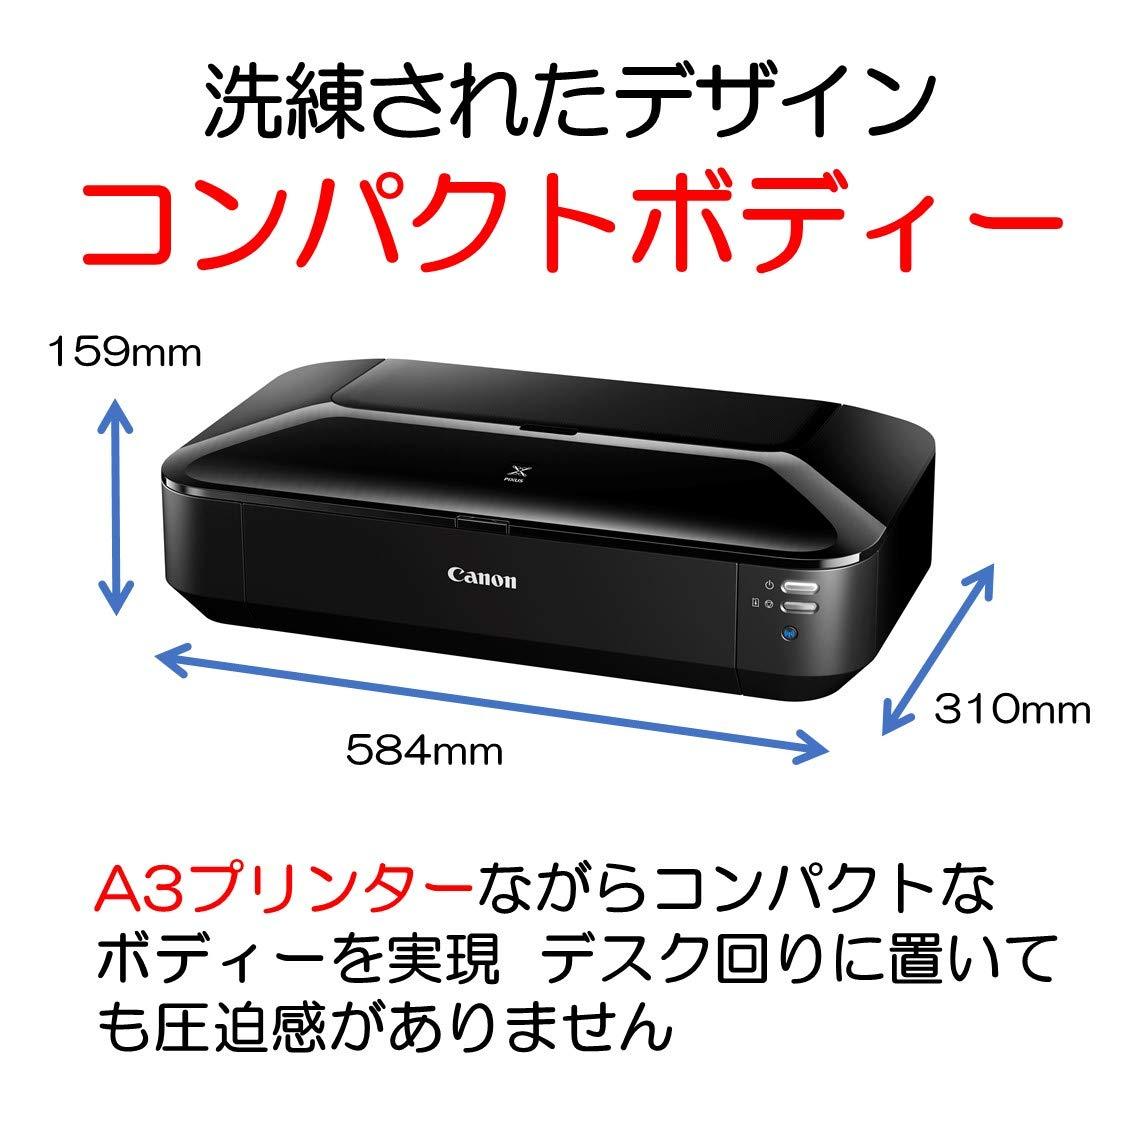 Amazon.com: Canon Pixus (Pixus A3), color InkJet Printer ...